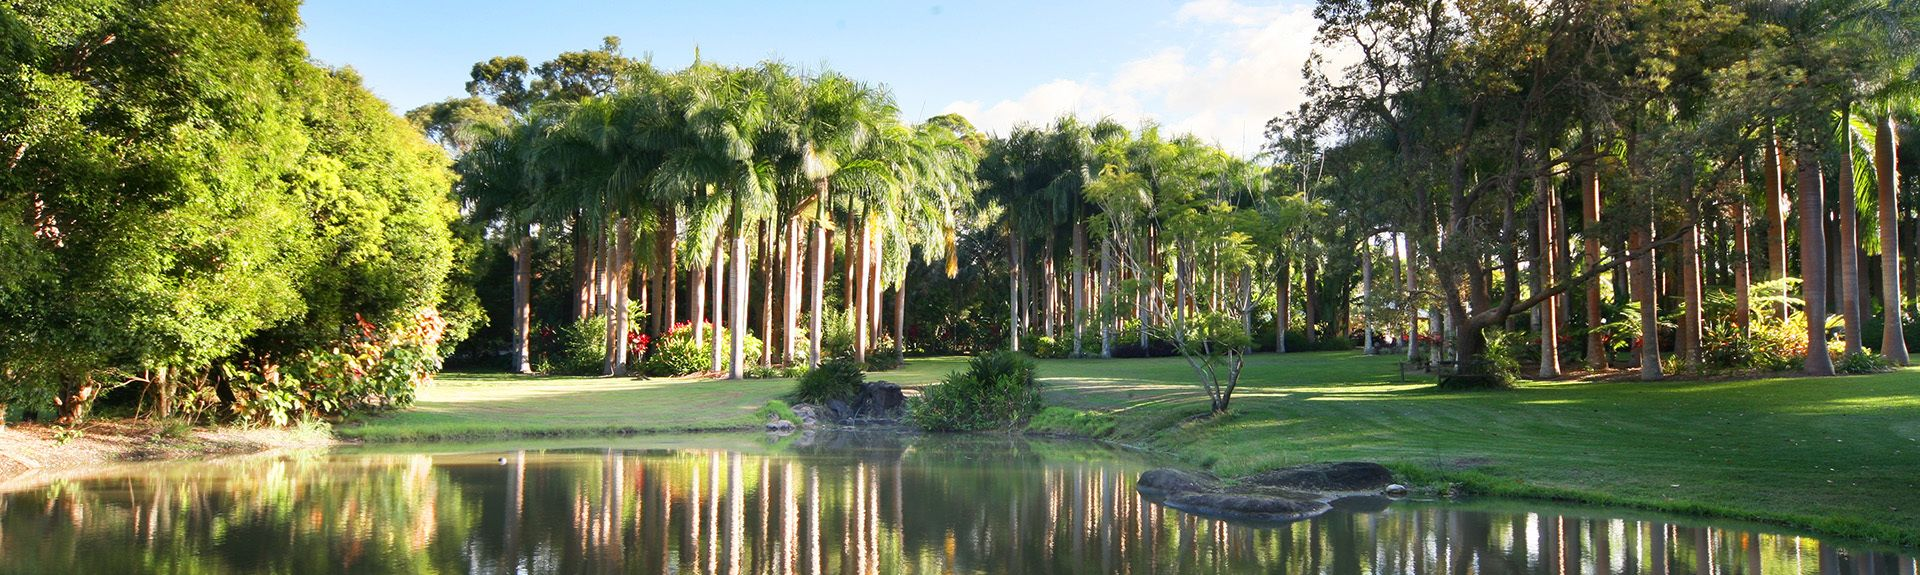 Big Pineapple (Ananasskulptur), Sunshine Coast, Queensland, Australien